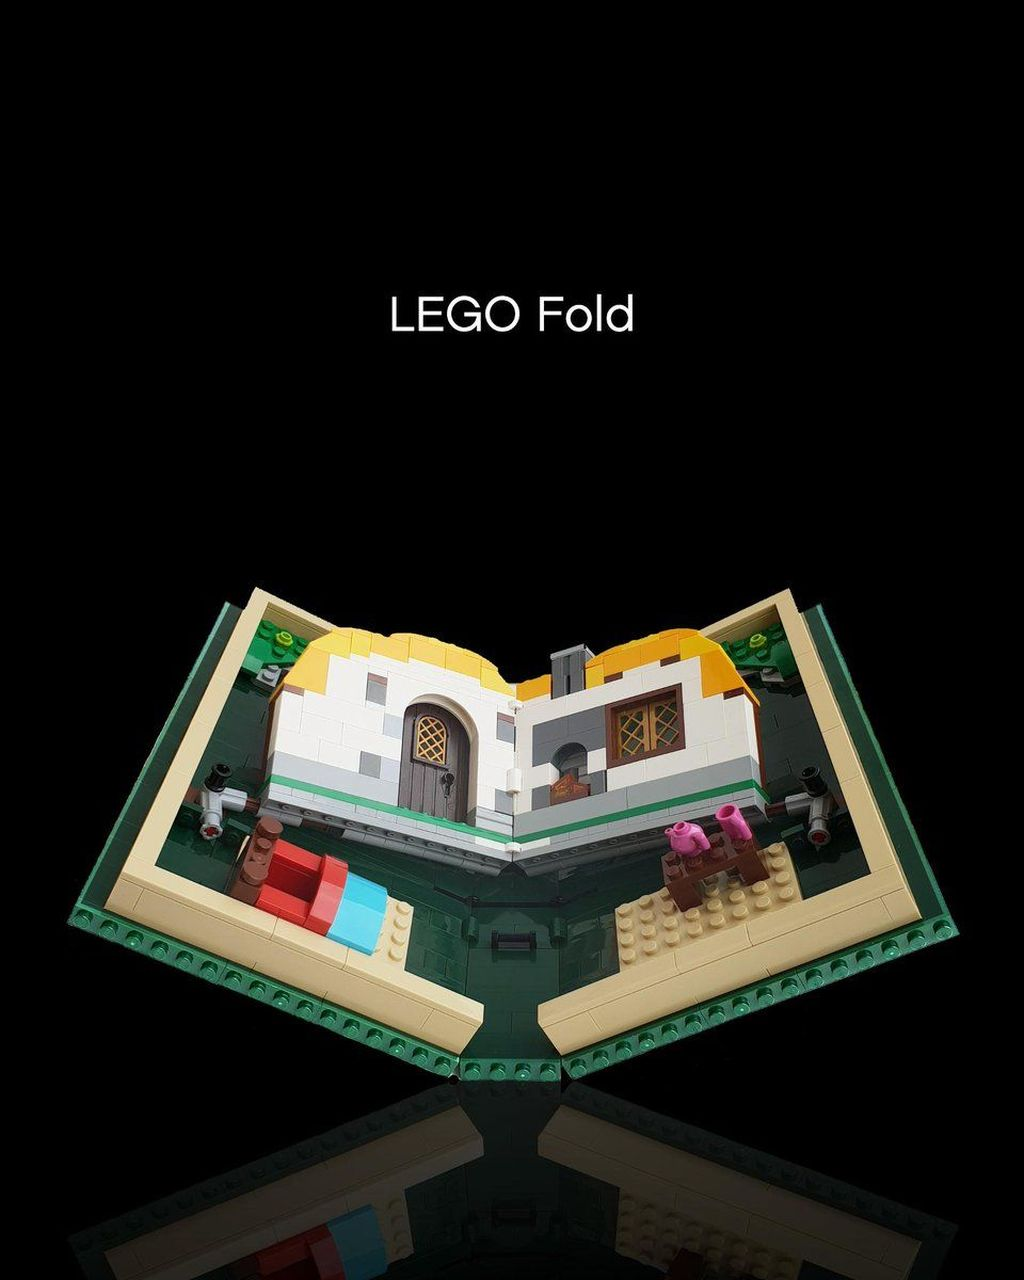 Perkenalkan Lego Fold. Bukan Galaxy Fold si ponsel layar lipat, tapi juga bisa dilipat. (Foto: Dok. Lego via Twitter)